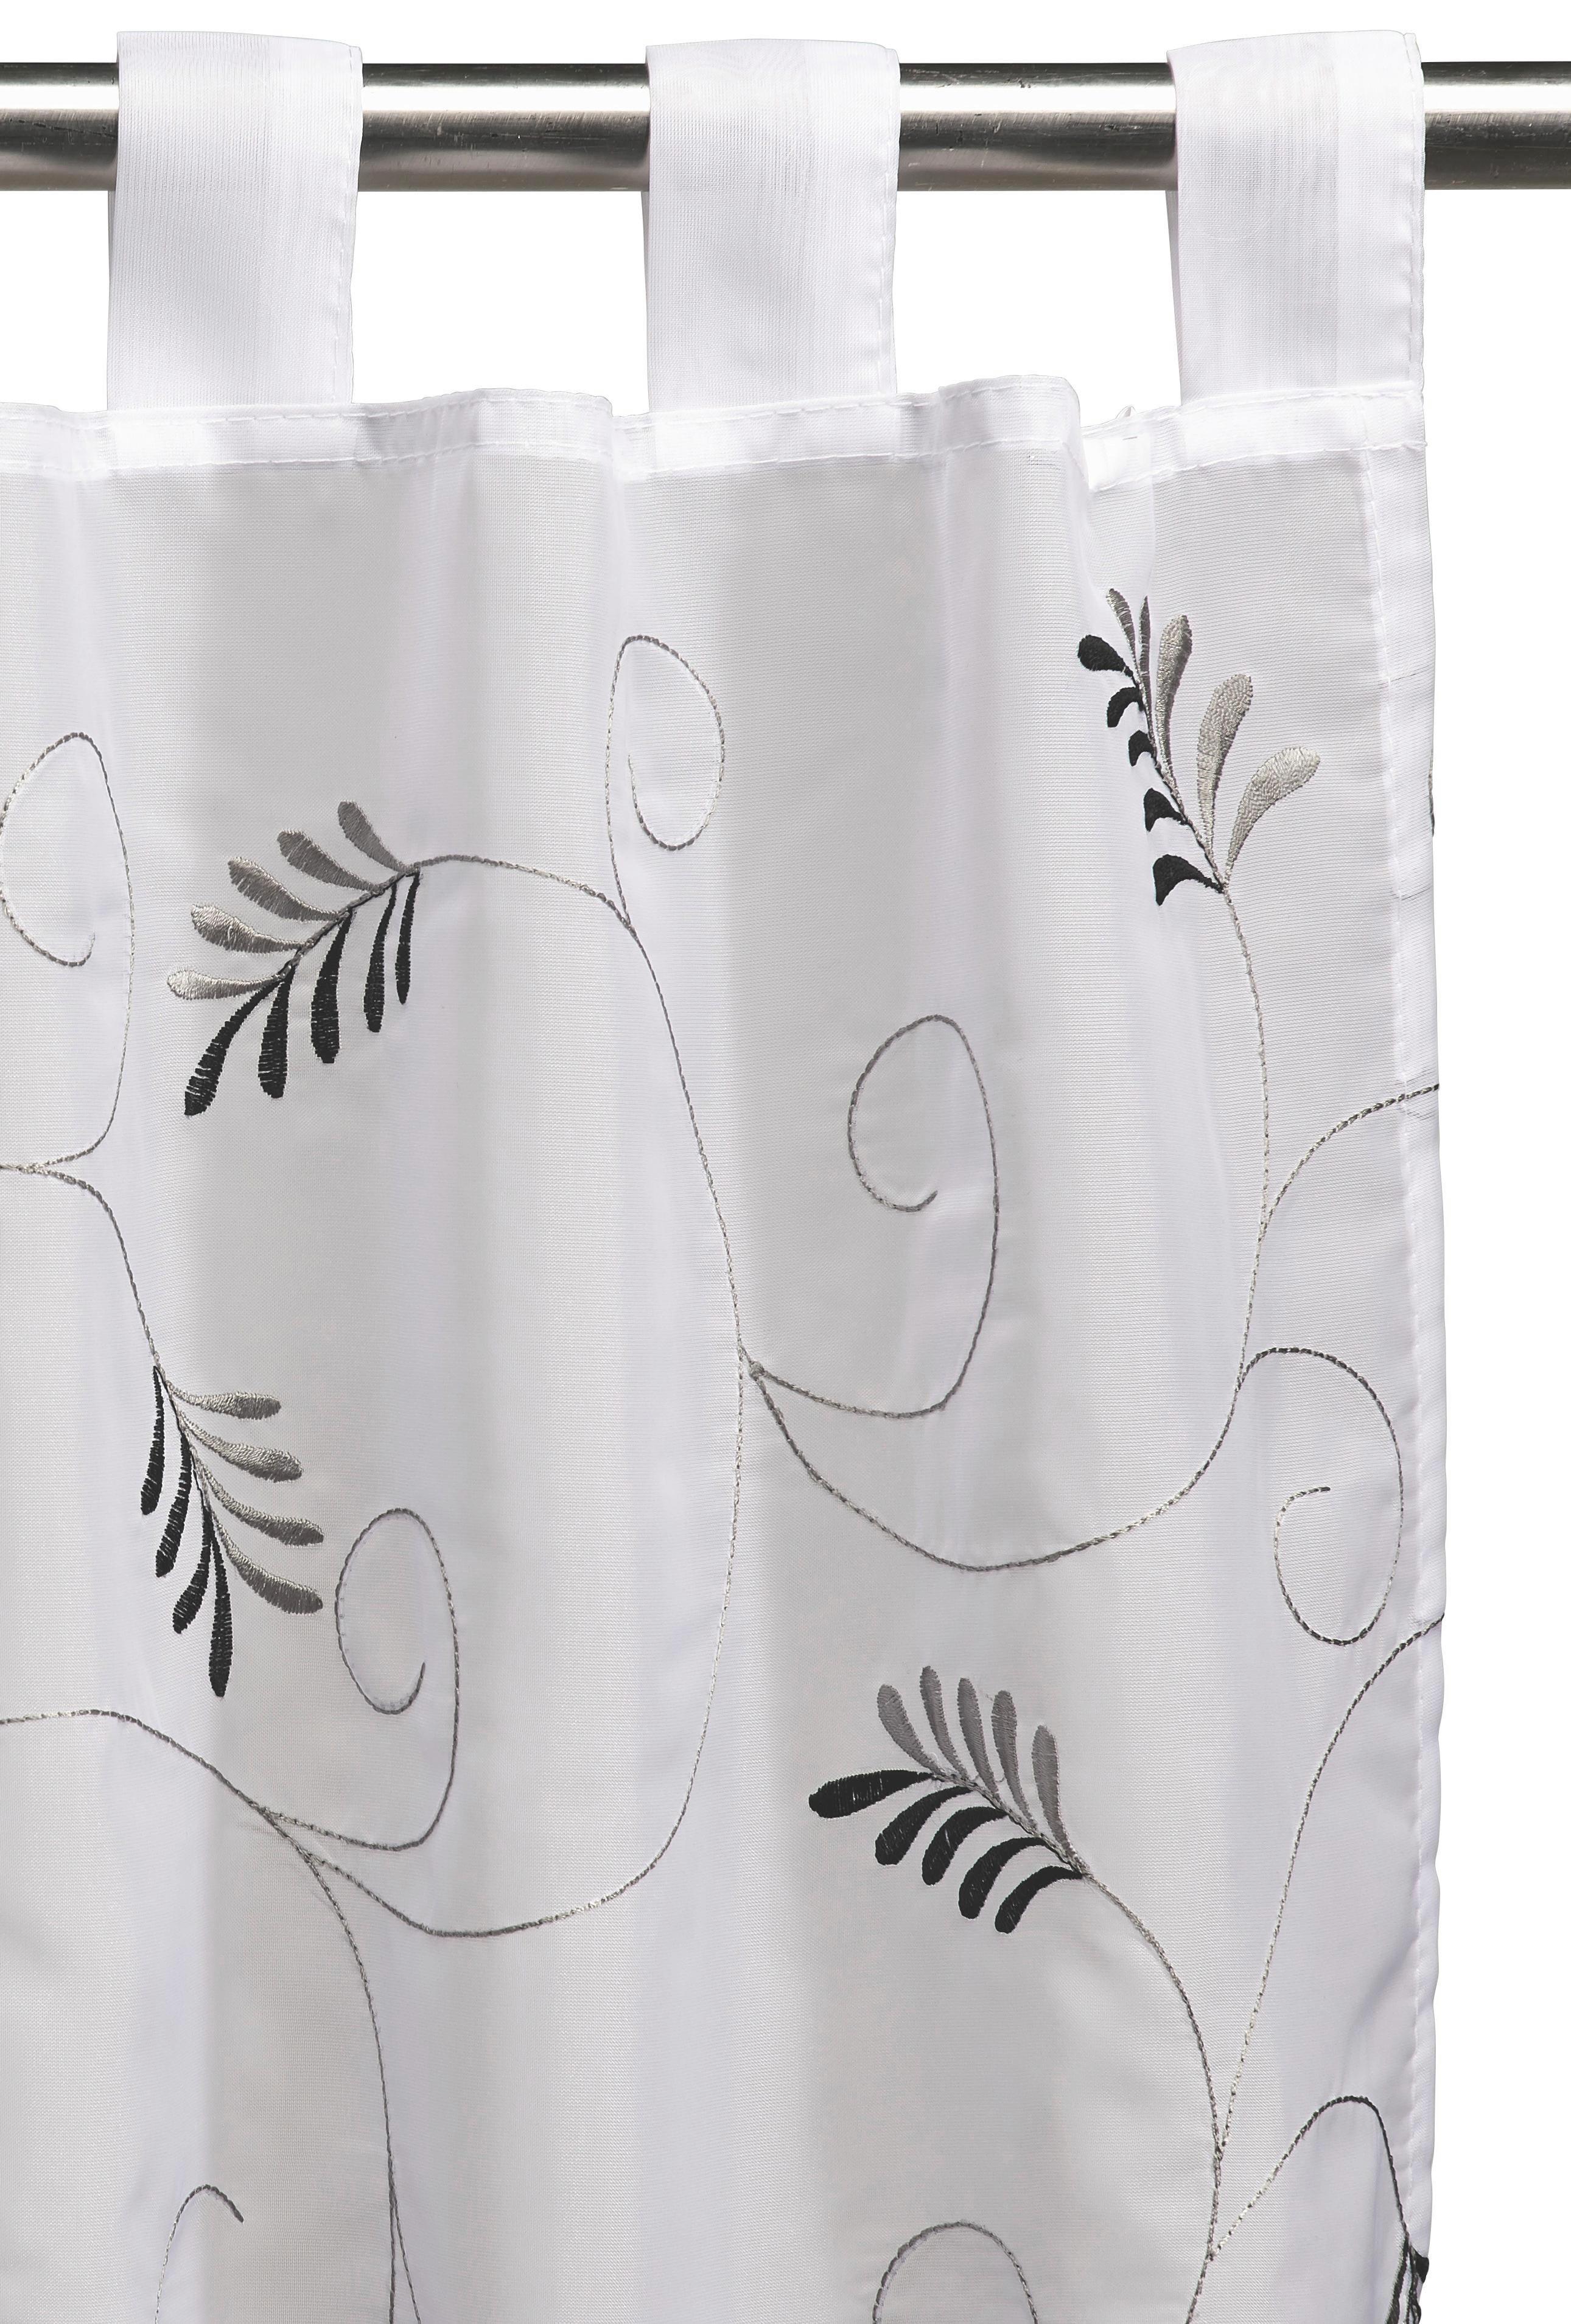 KURZGARDINE   148/48 cm - Schwarz, Basics, Textil (148/48cm) - BOXXX